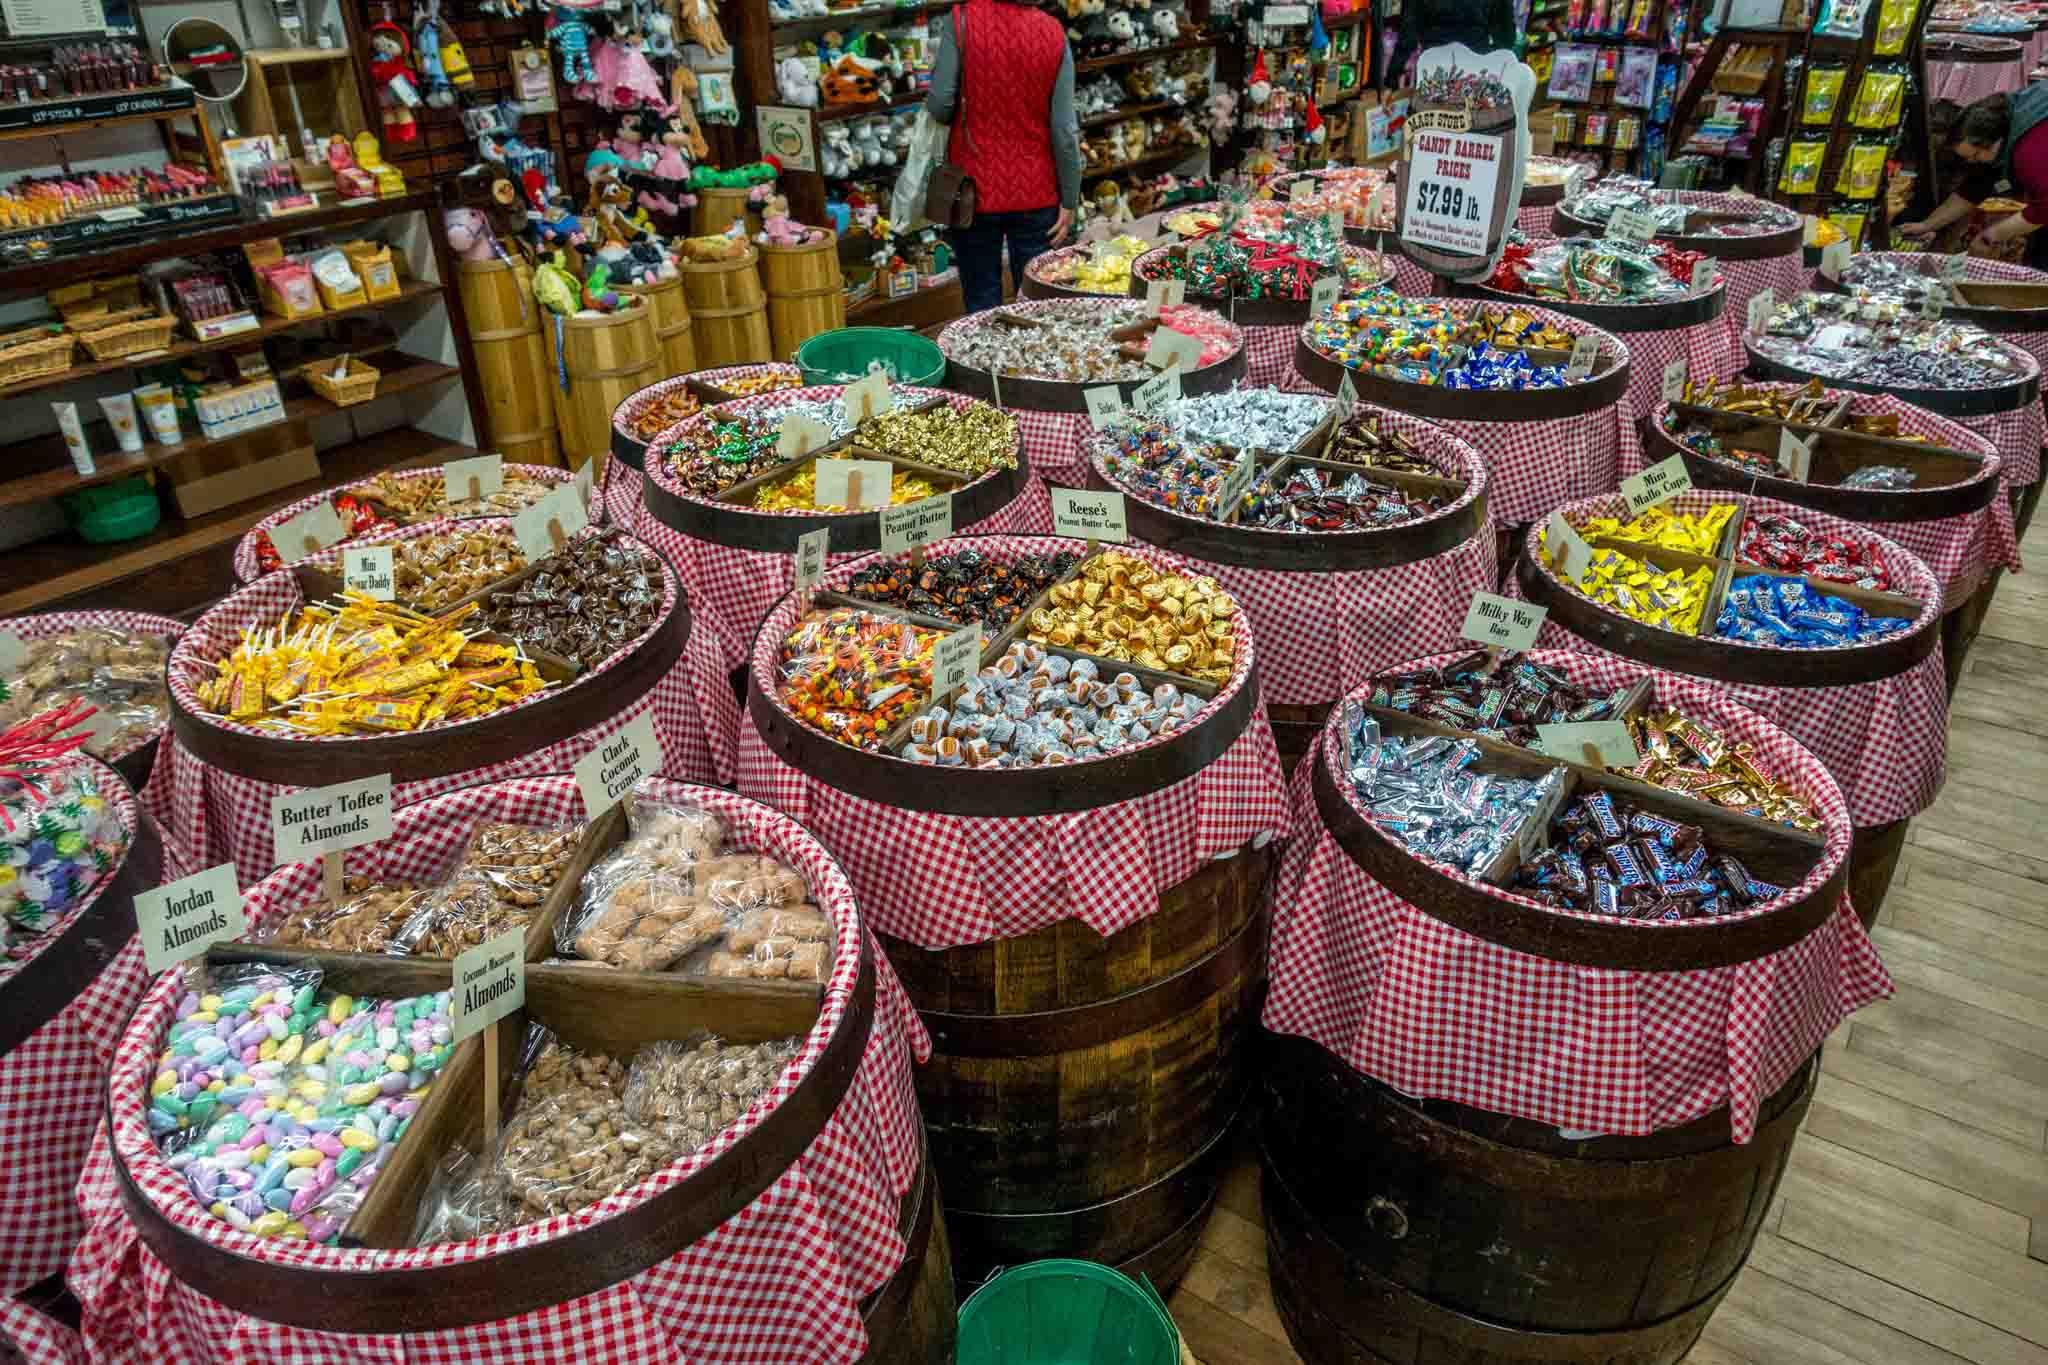 Barrels of bulk candy for sale at Mast General Store in Winston Salem